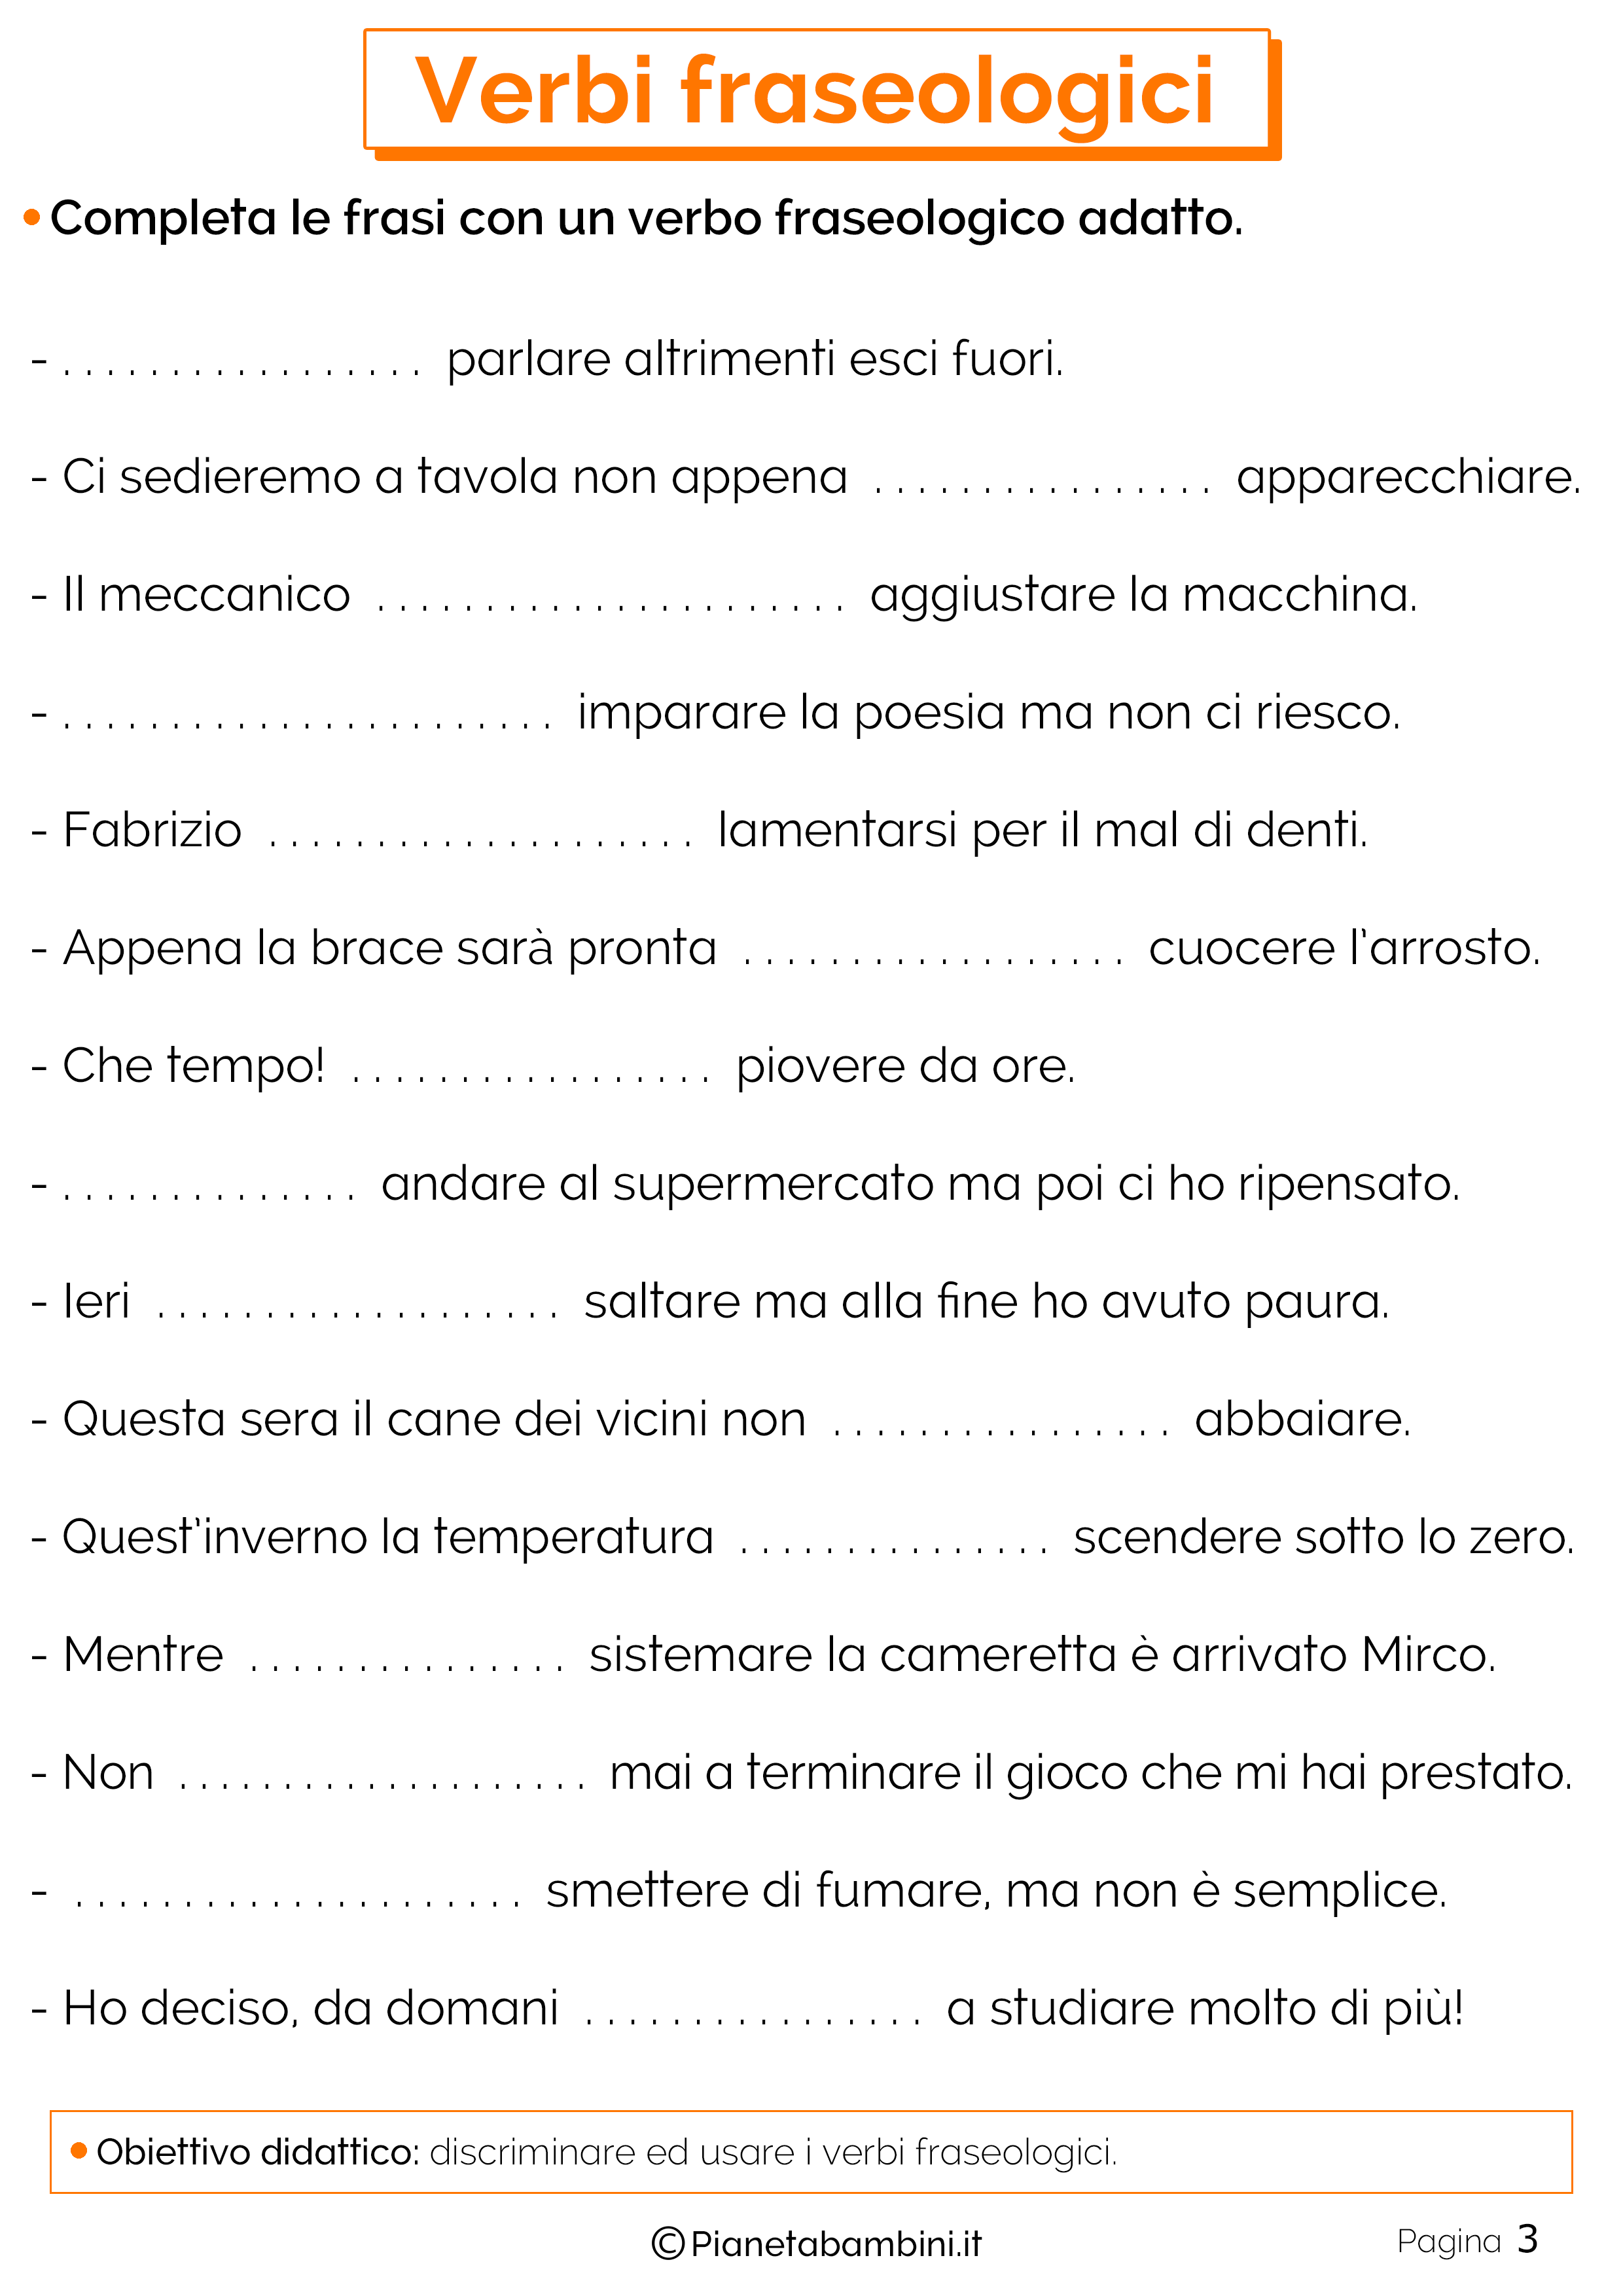 Schede didattiche sui verbi fraseologici 3